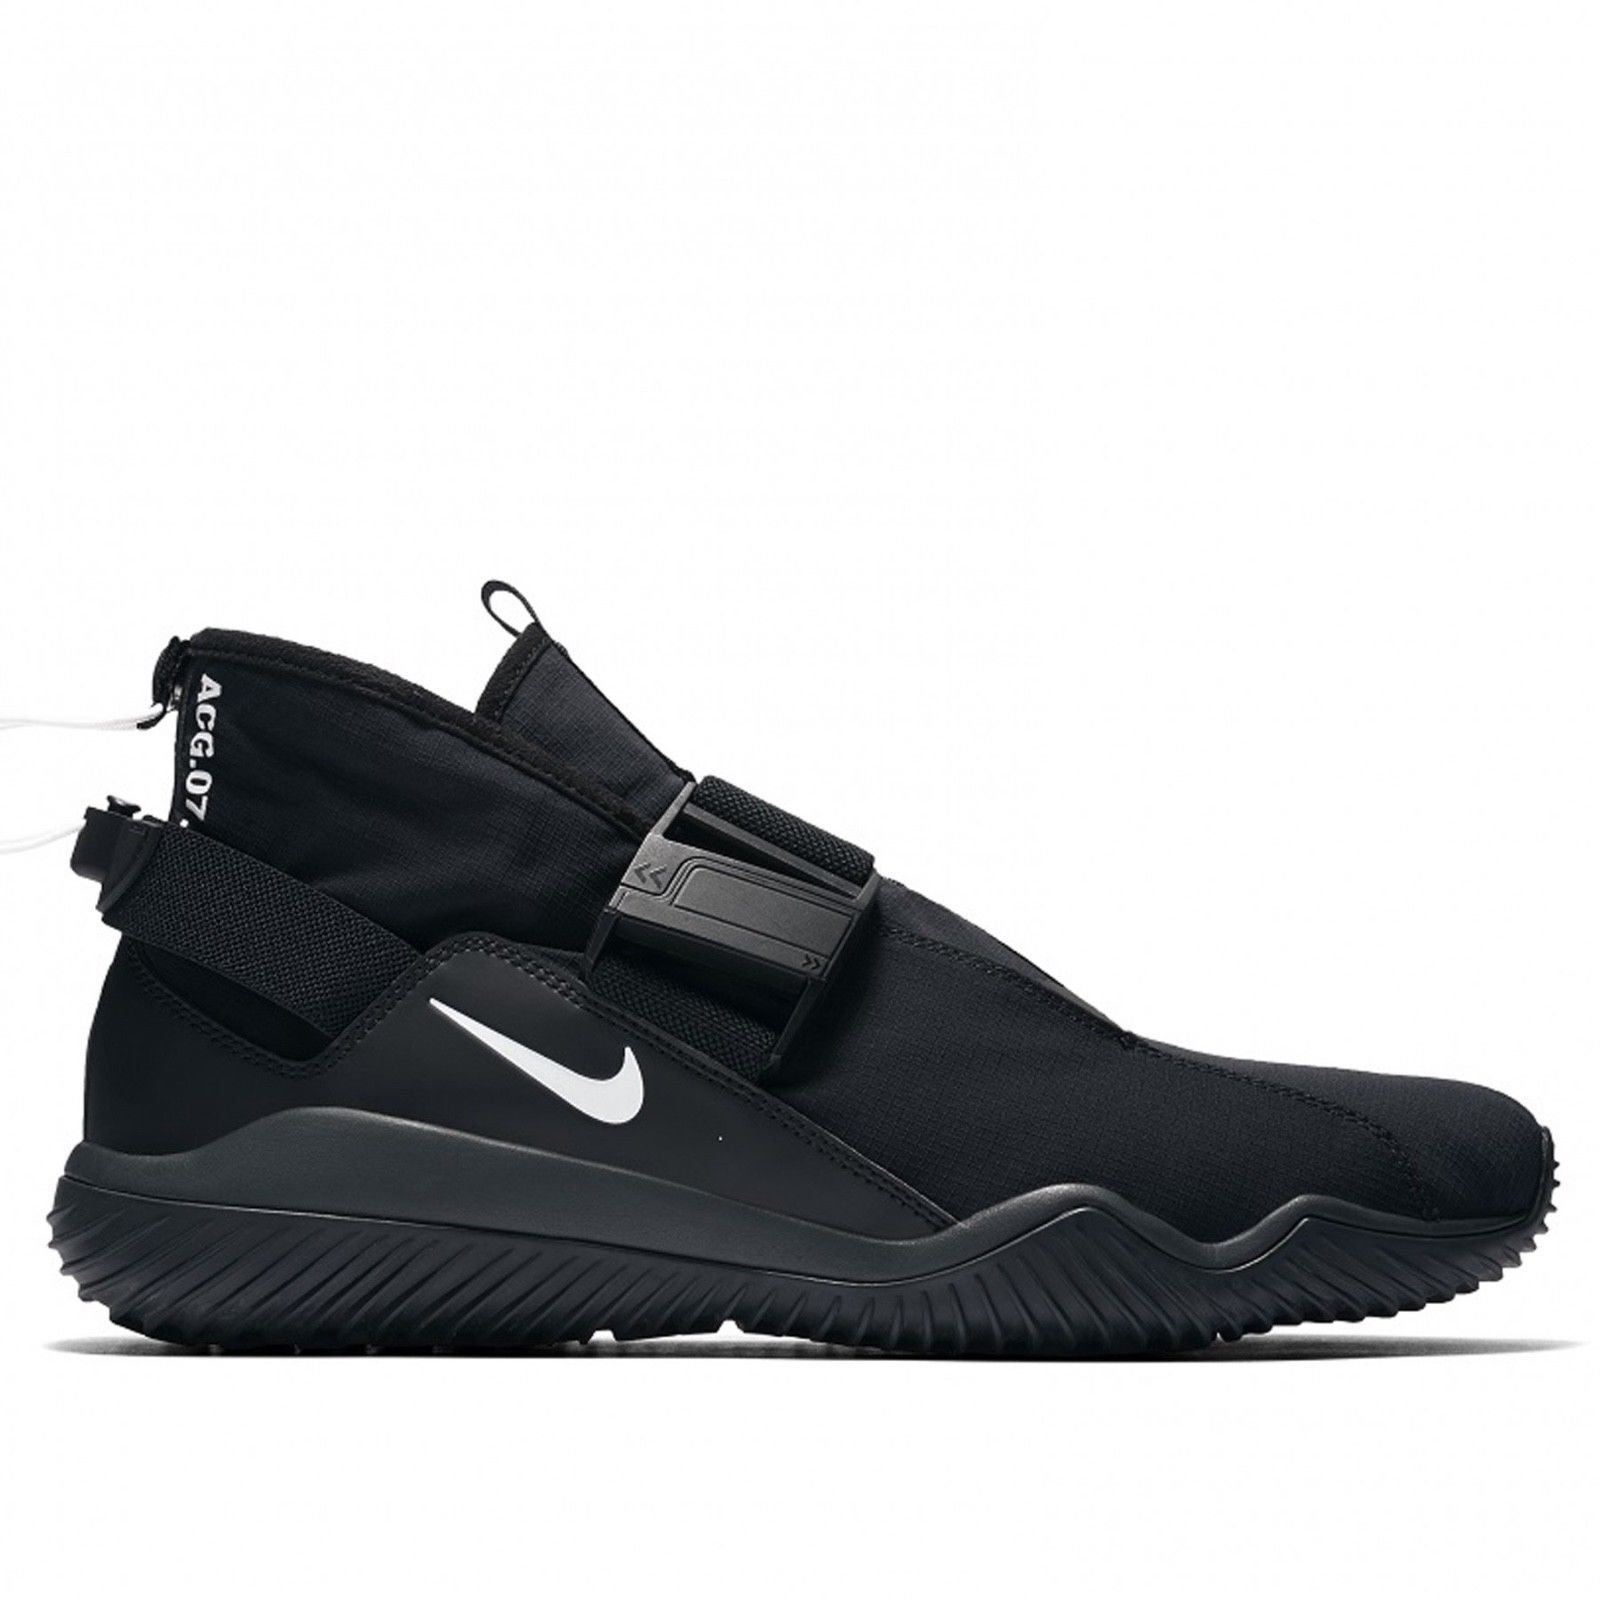 New Men's NikeLab Nike ACG 07 KMTR Komyuter Black White Comfortable The most popular shoes for men and women